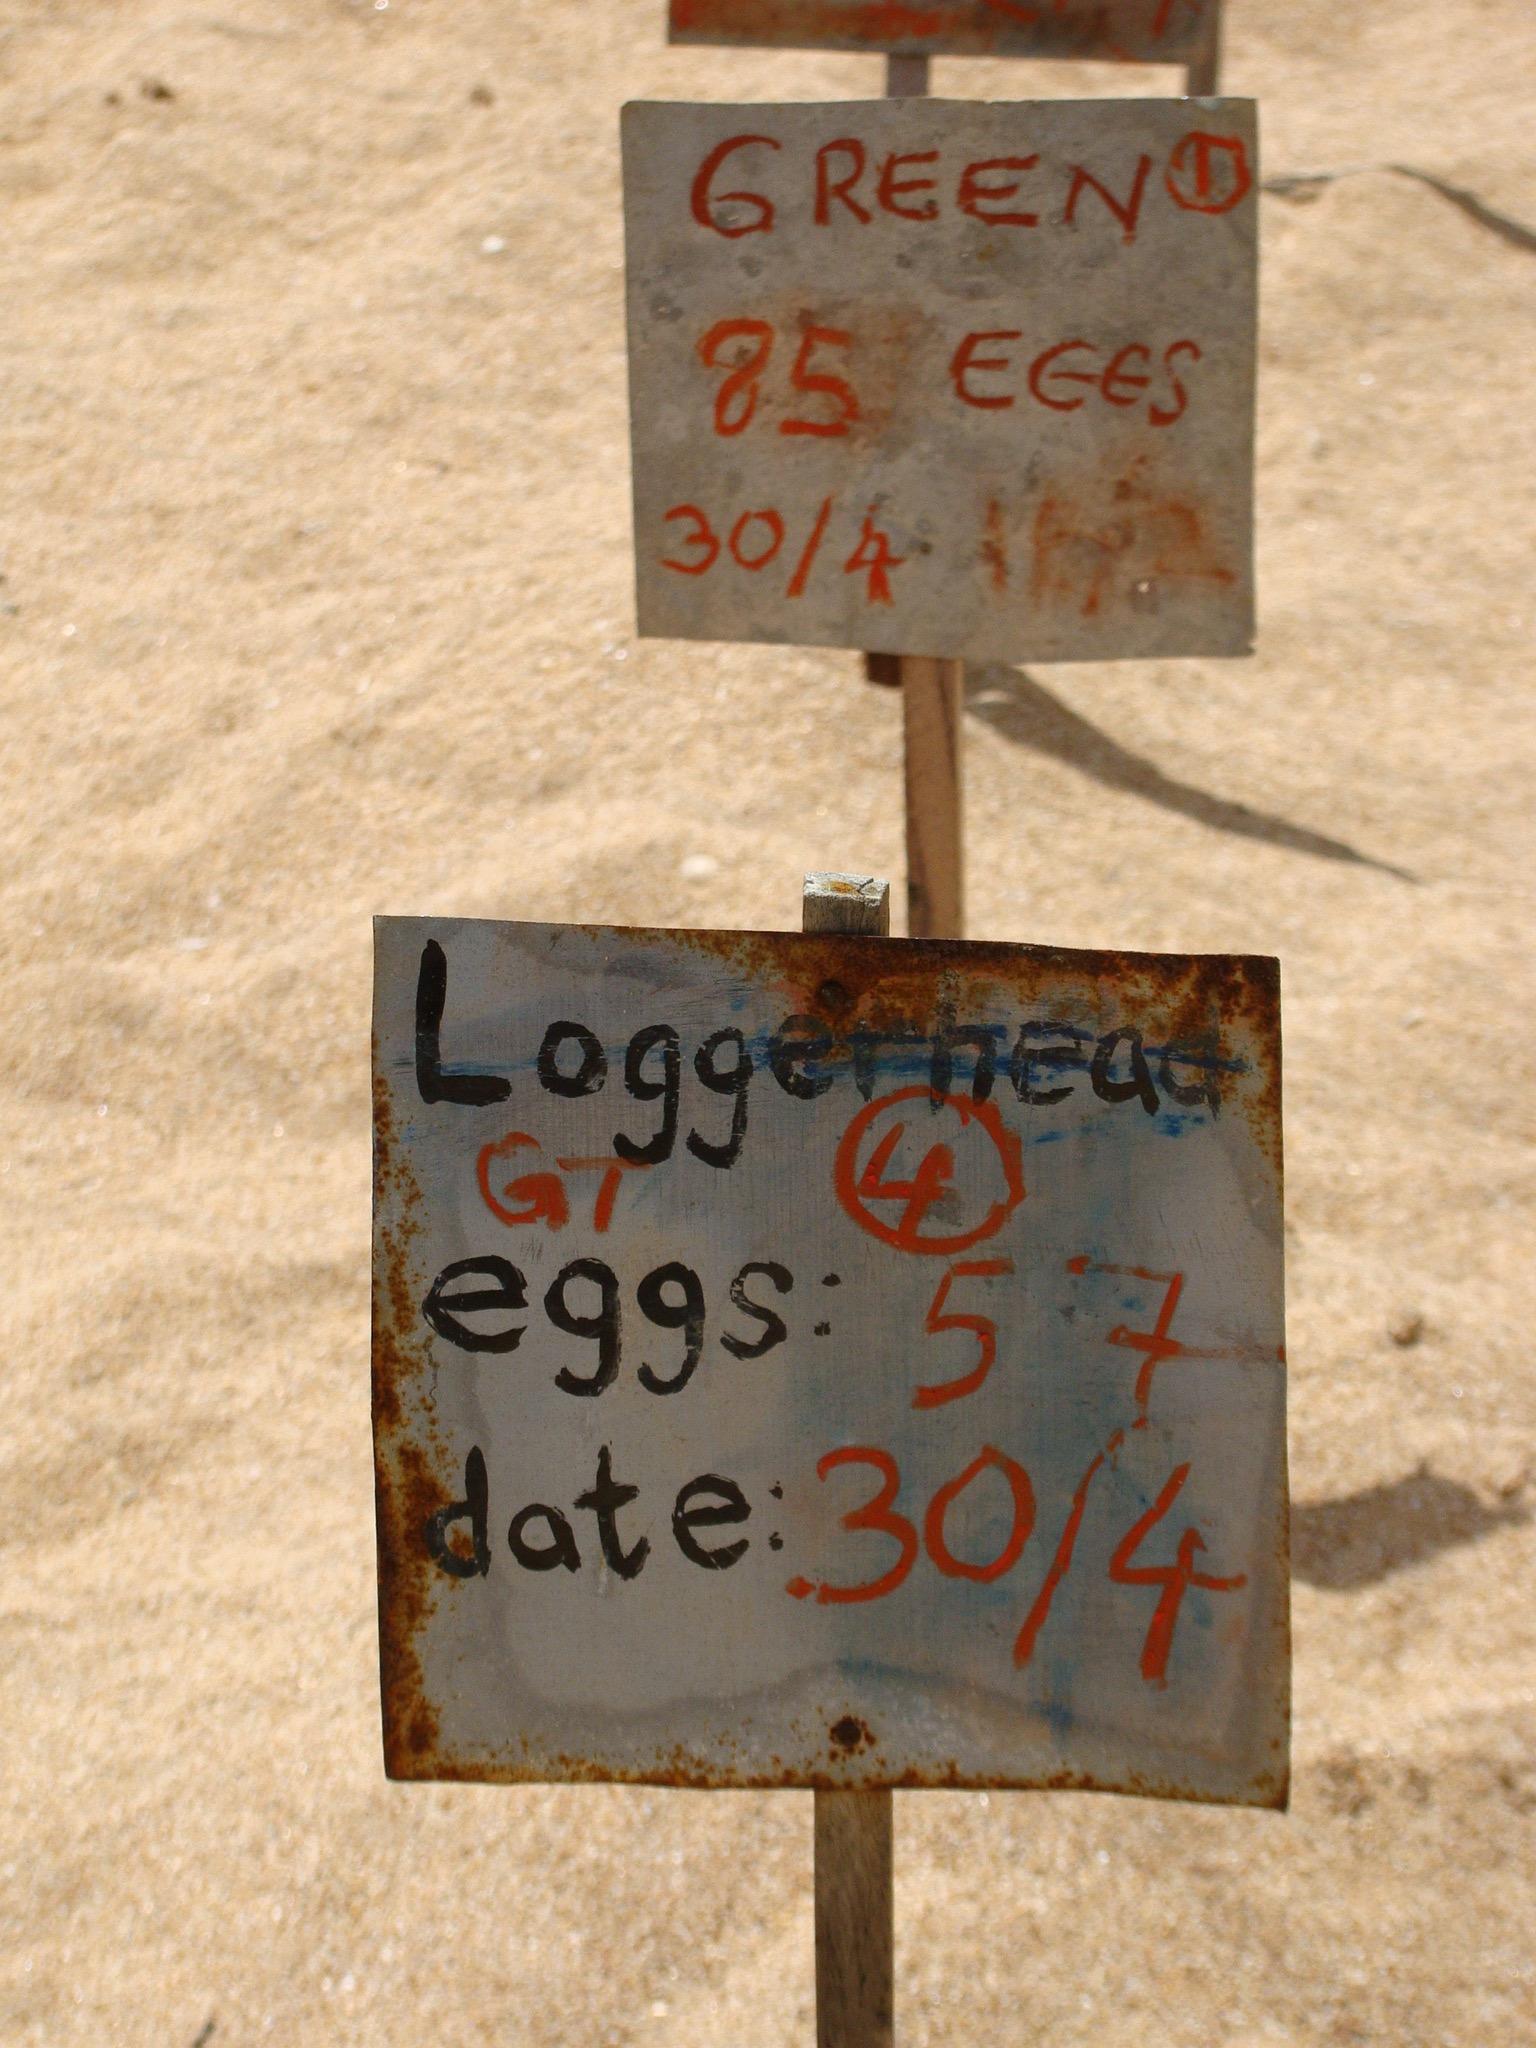 Der Schildkröten-Eier-Dealer